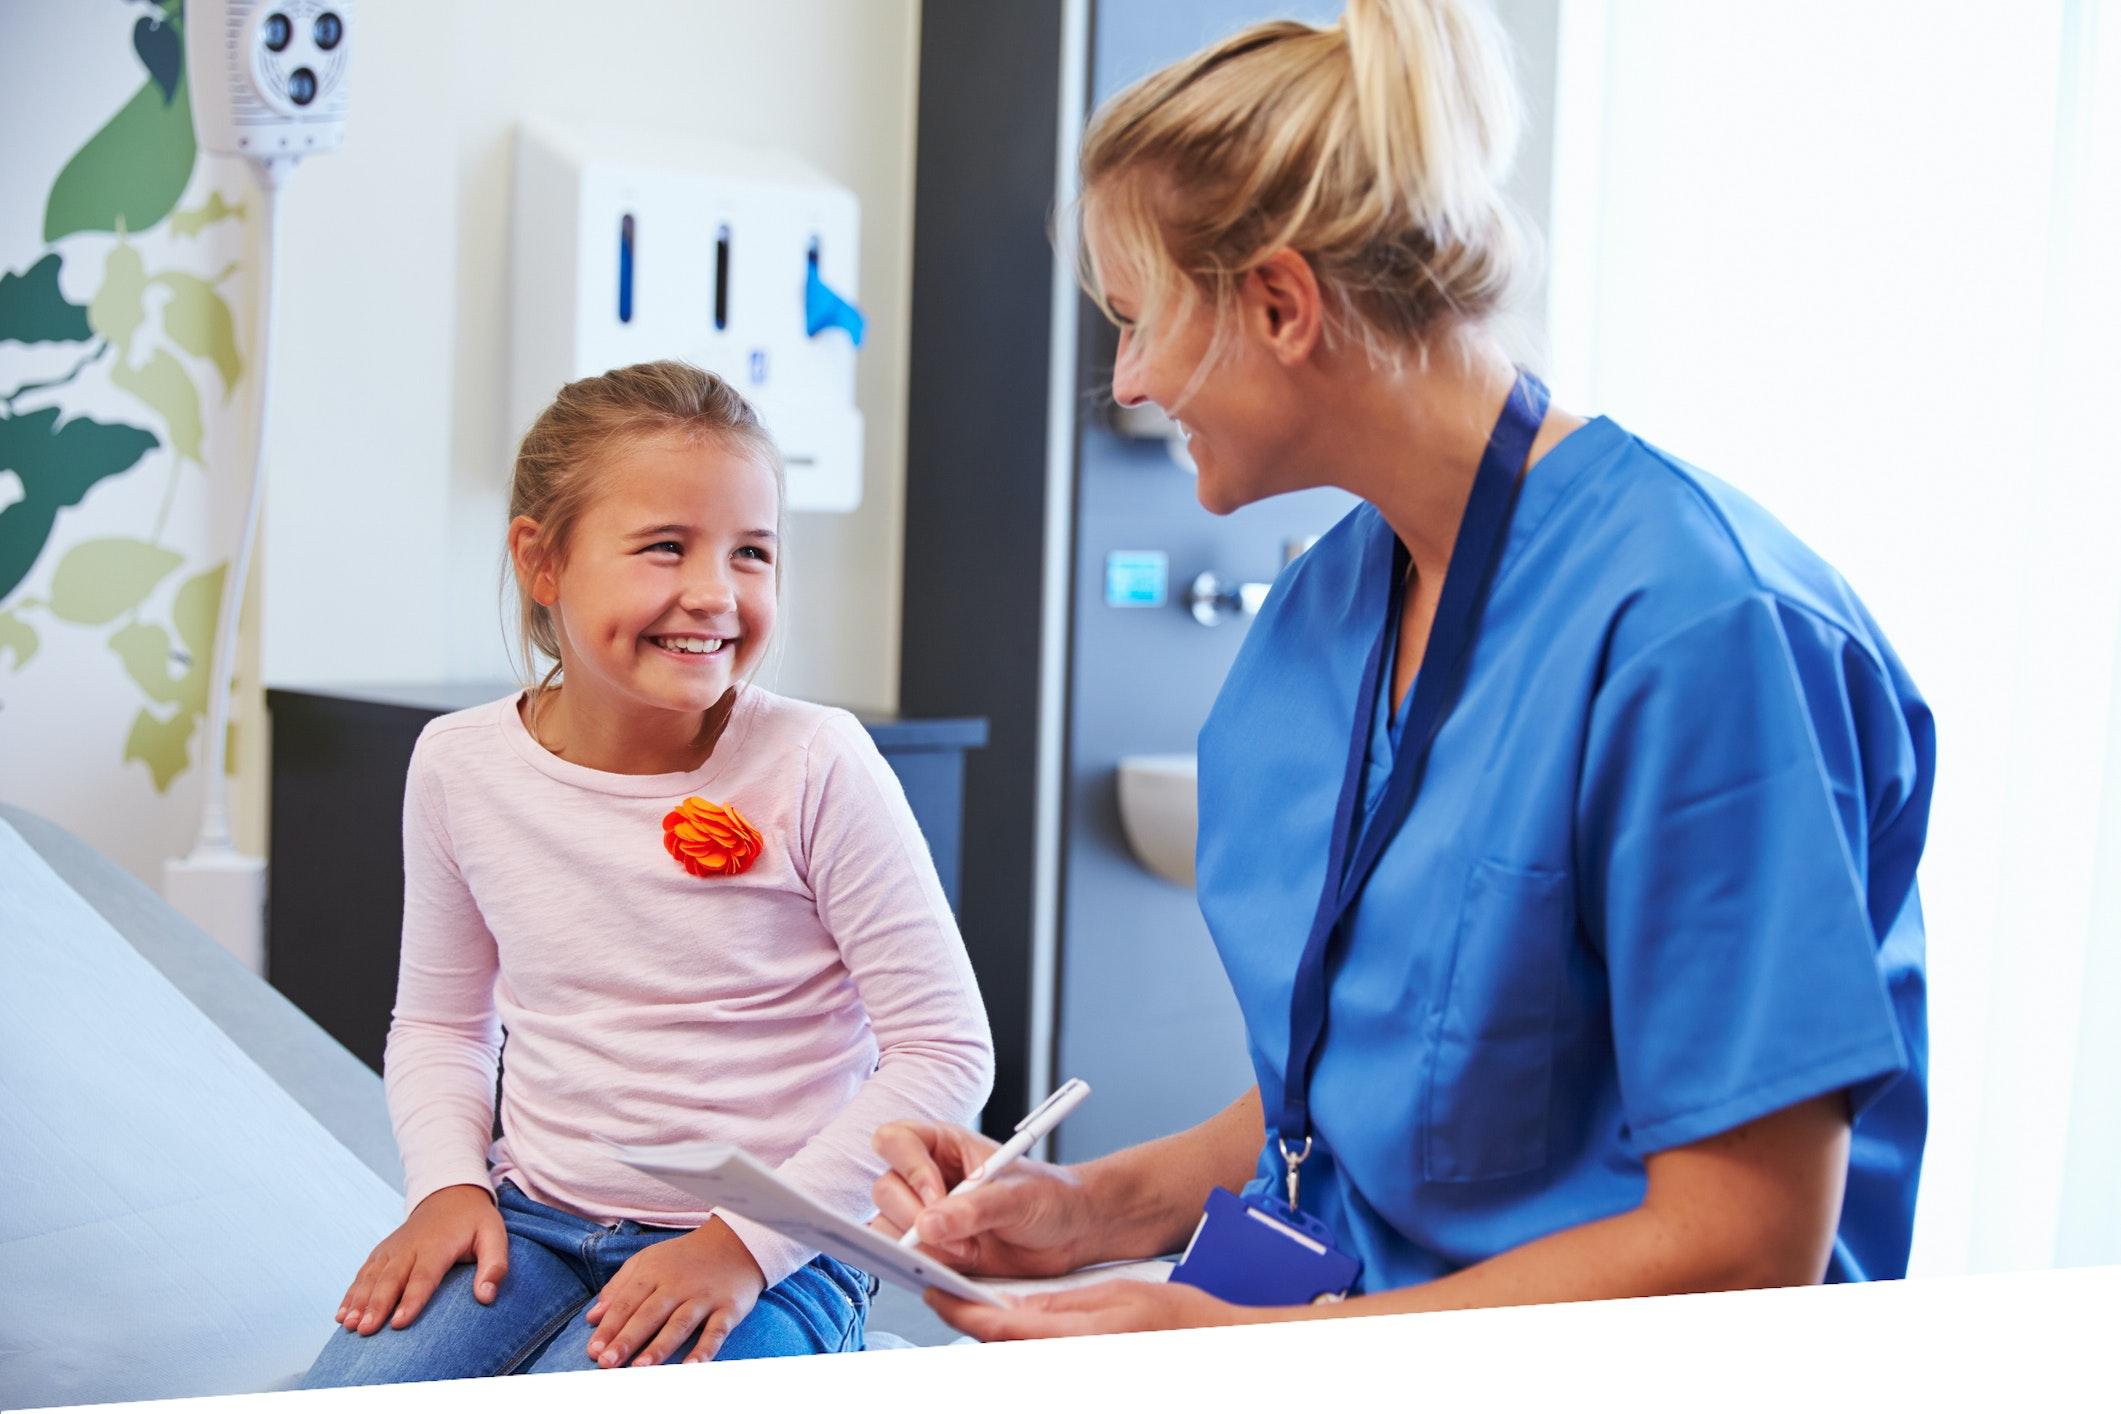 Kinderkrankenschwester mit Kind